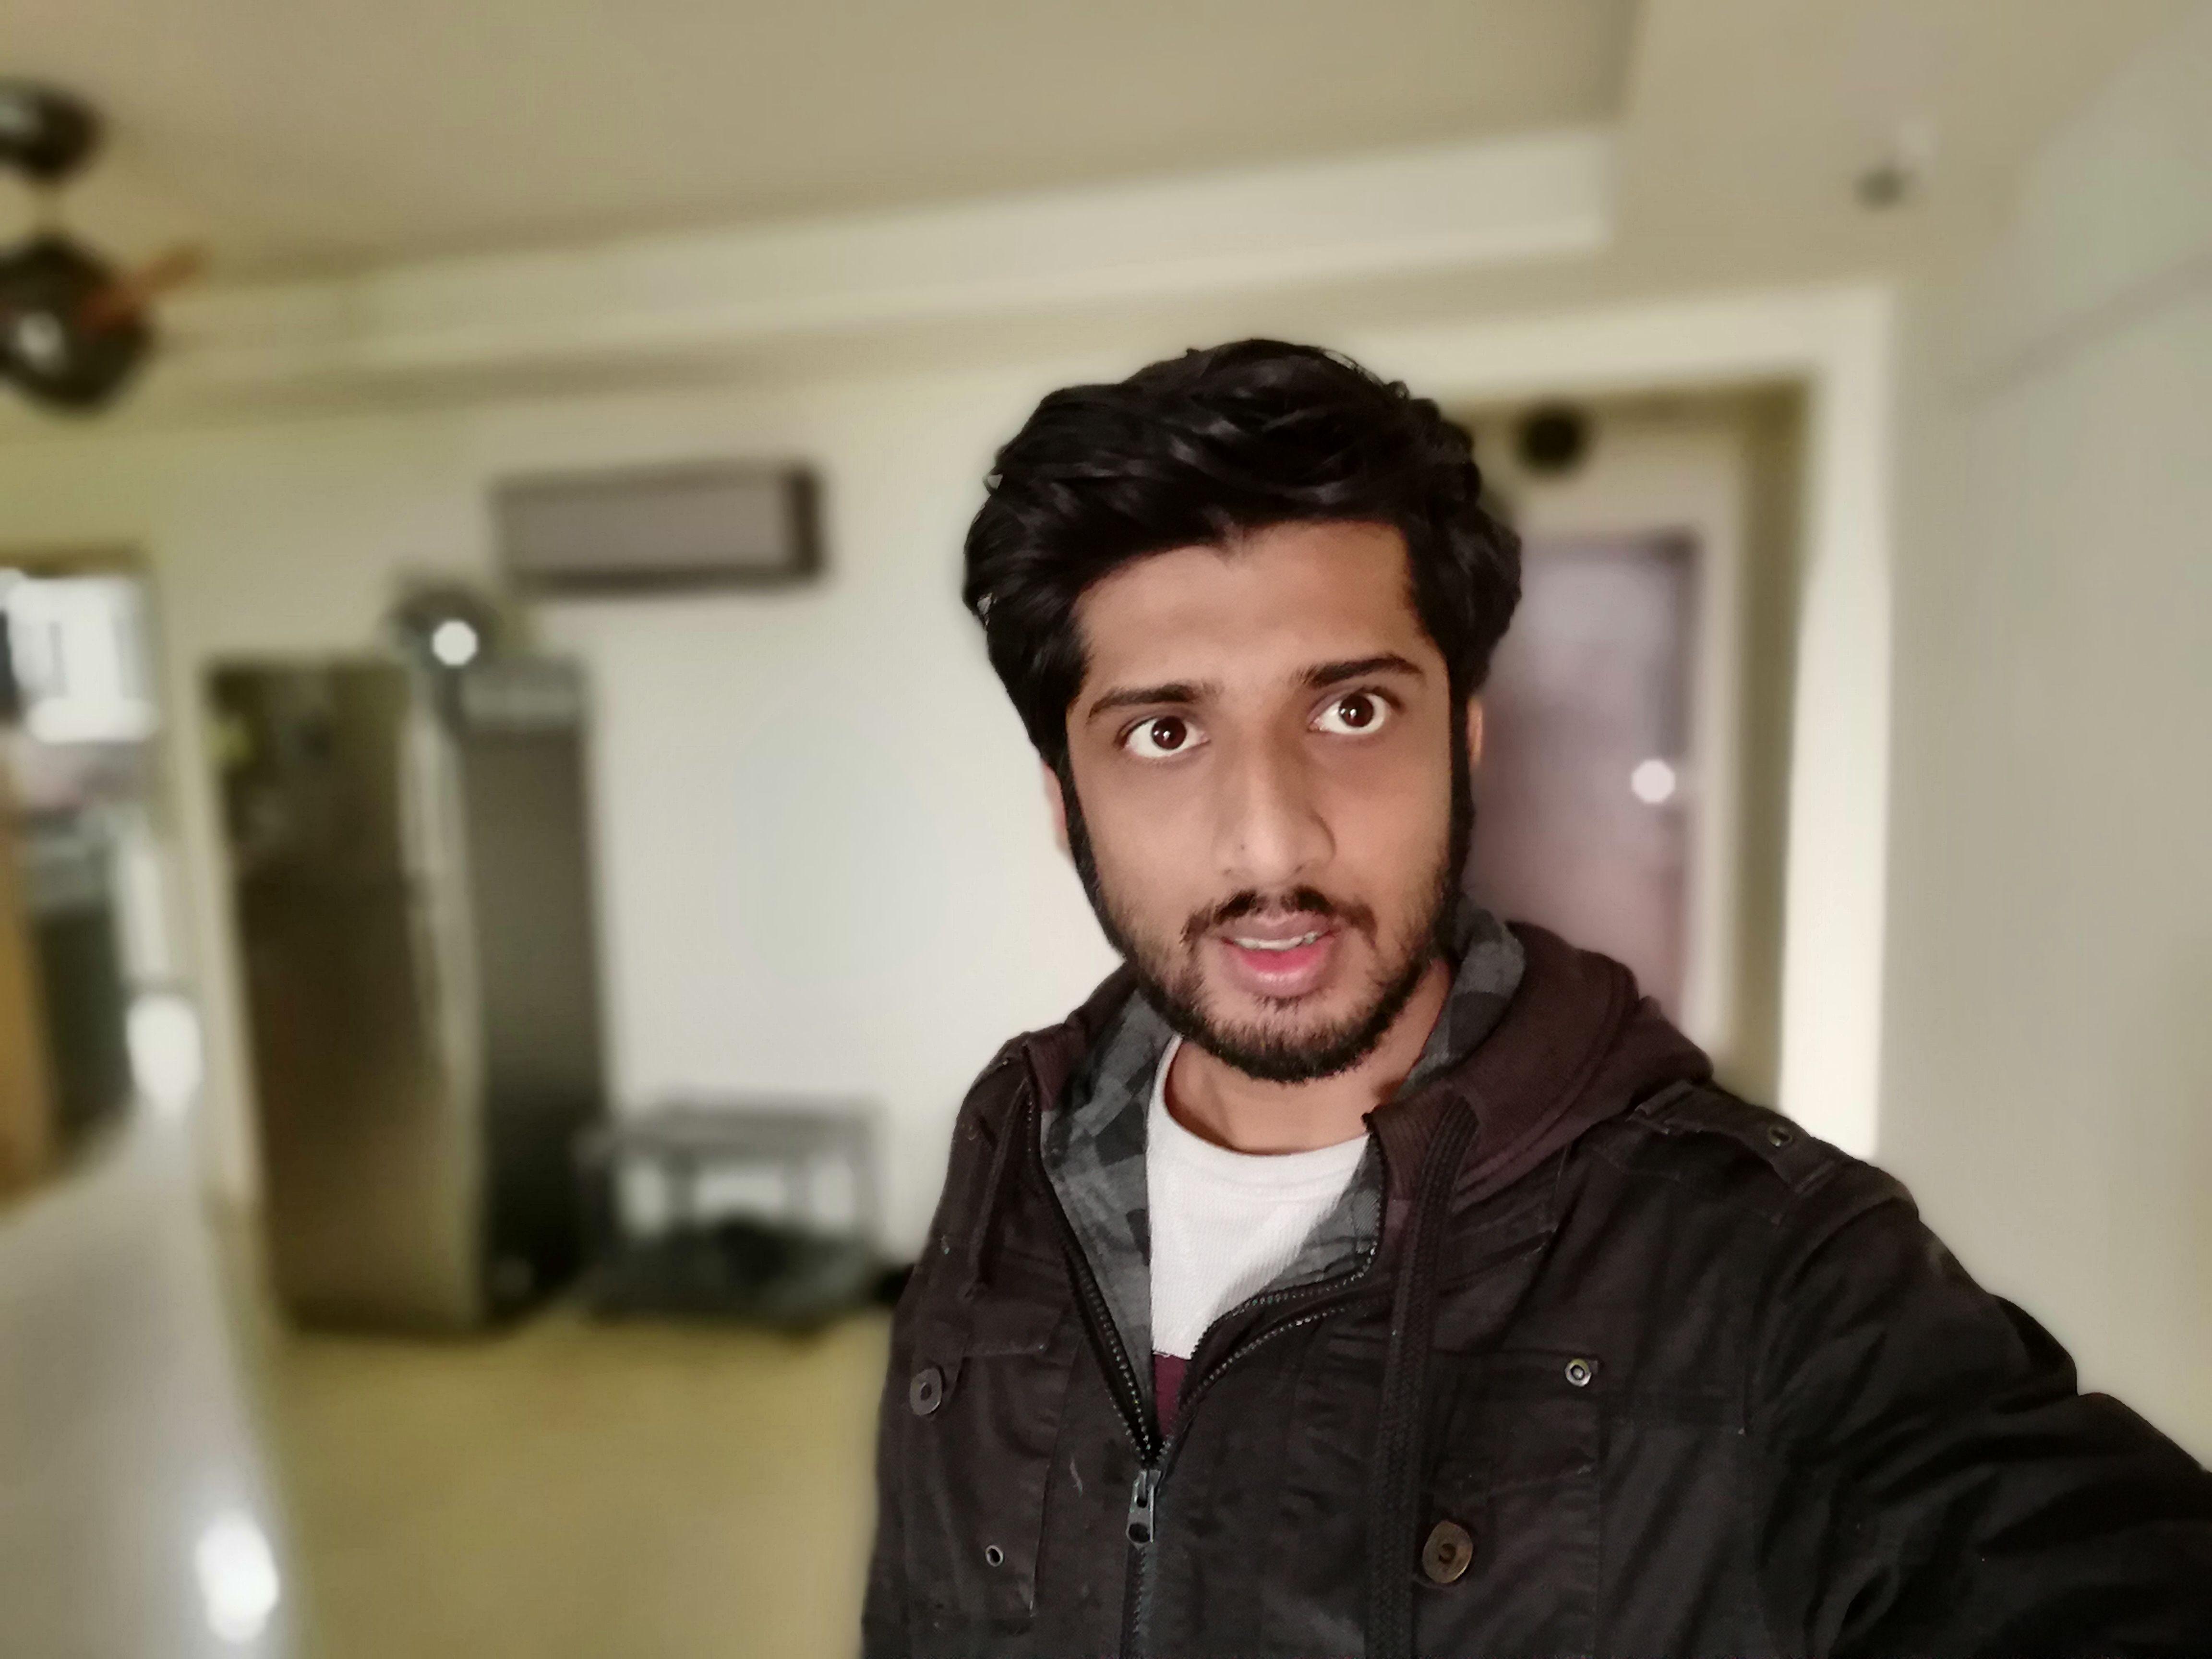 HONOR 9X - Camera Sample - Selfie Portrait